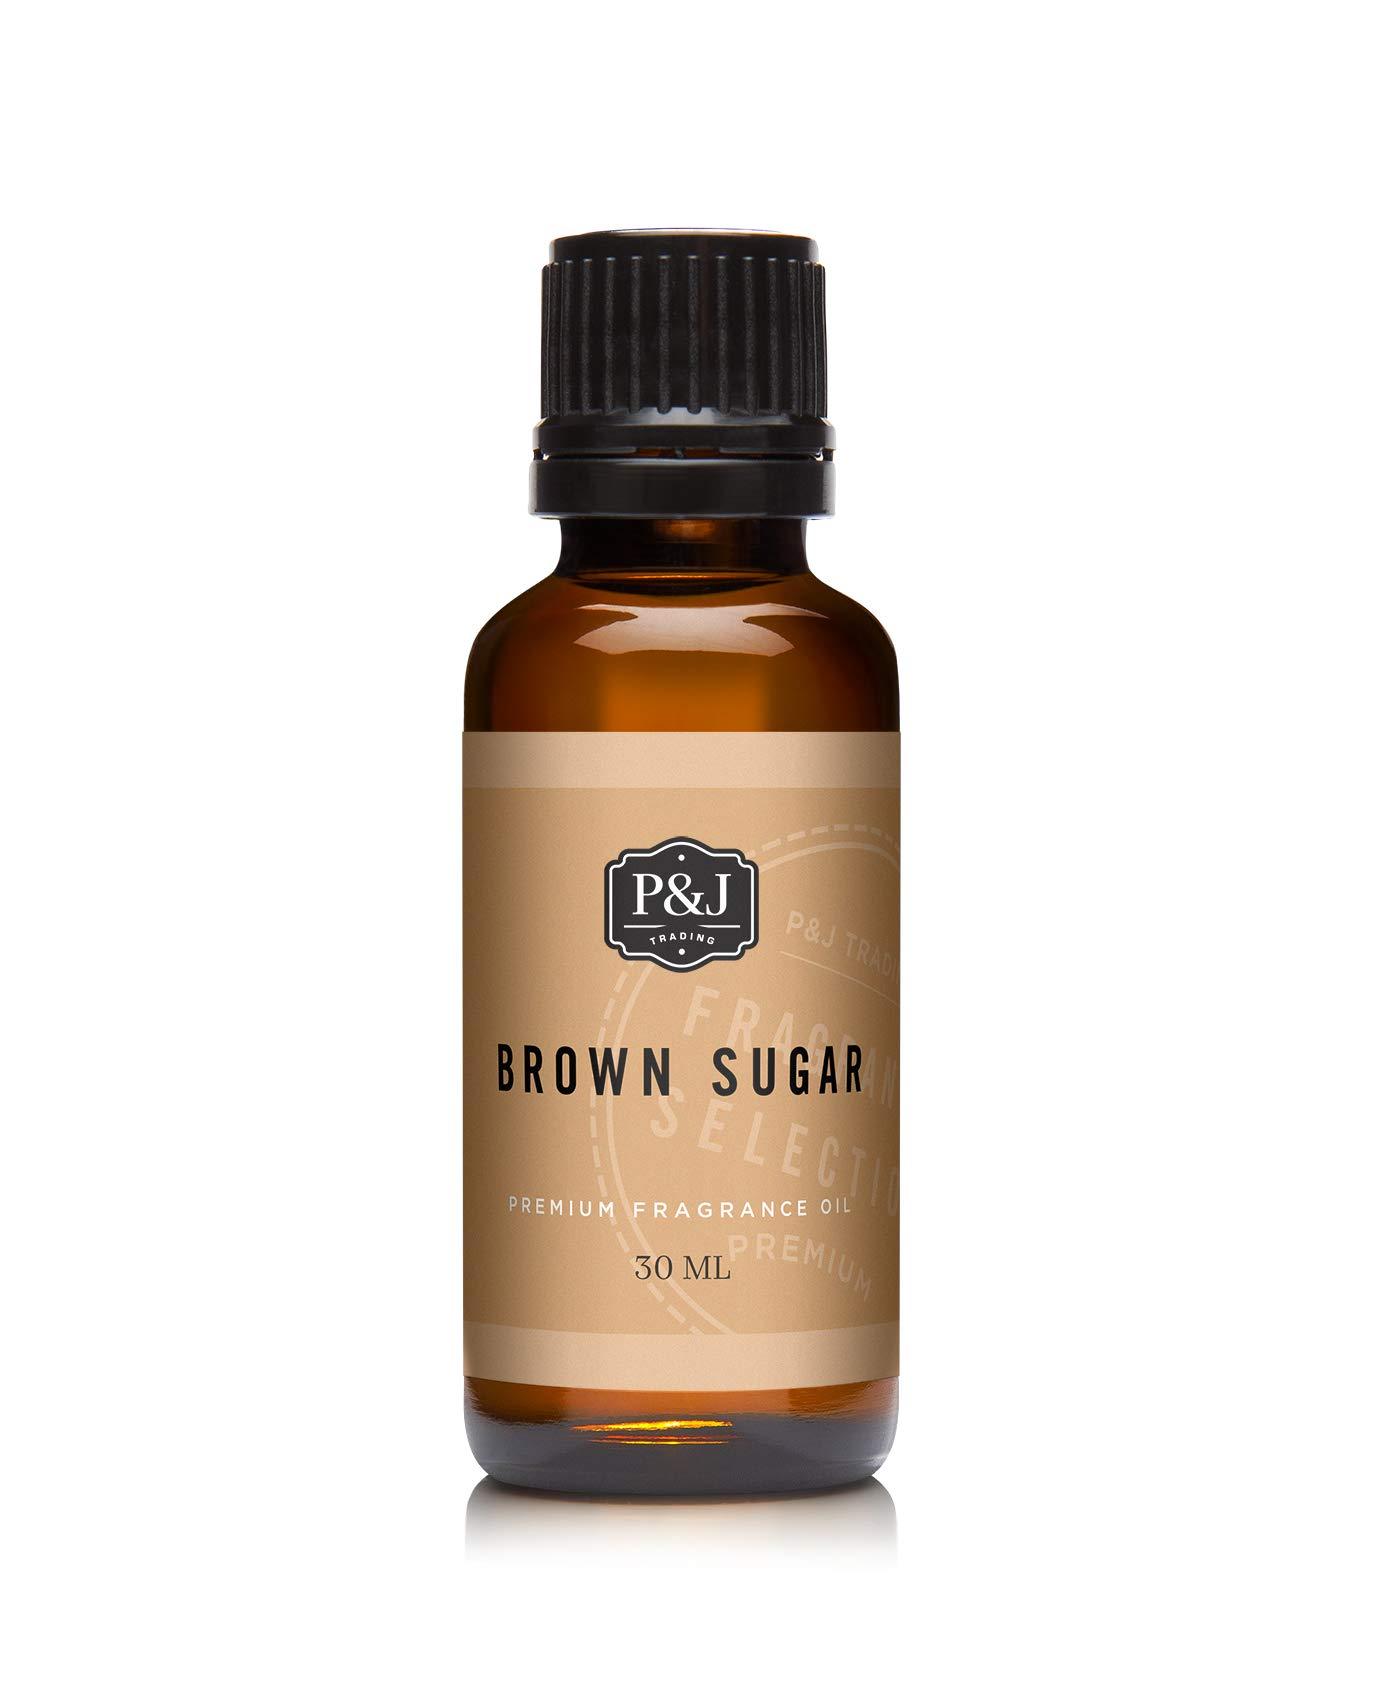 P&J Trading Brown Sugar Premium Grade Fragrance Oil - Perfume Oil - 1oz/30ml